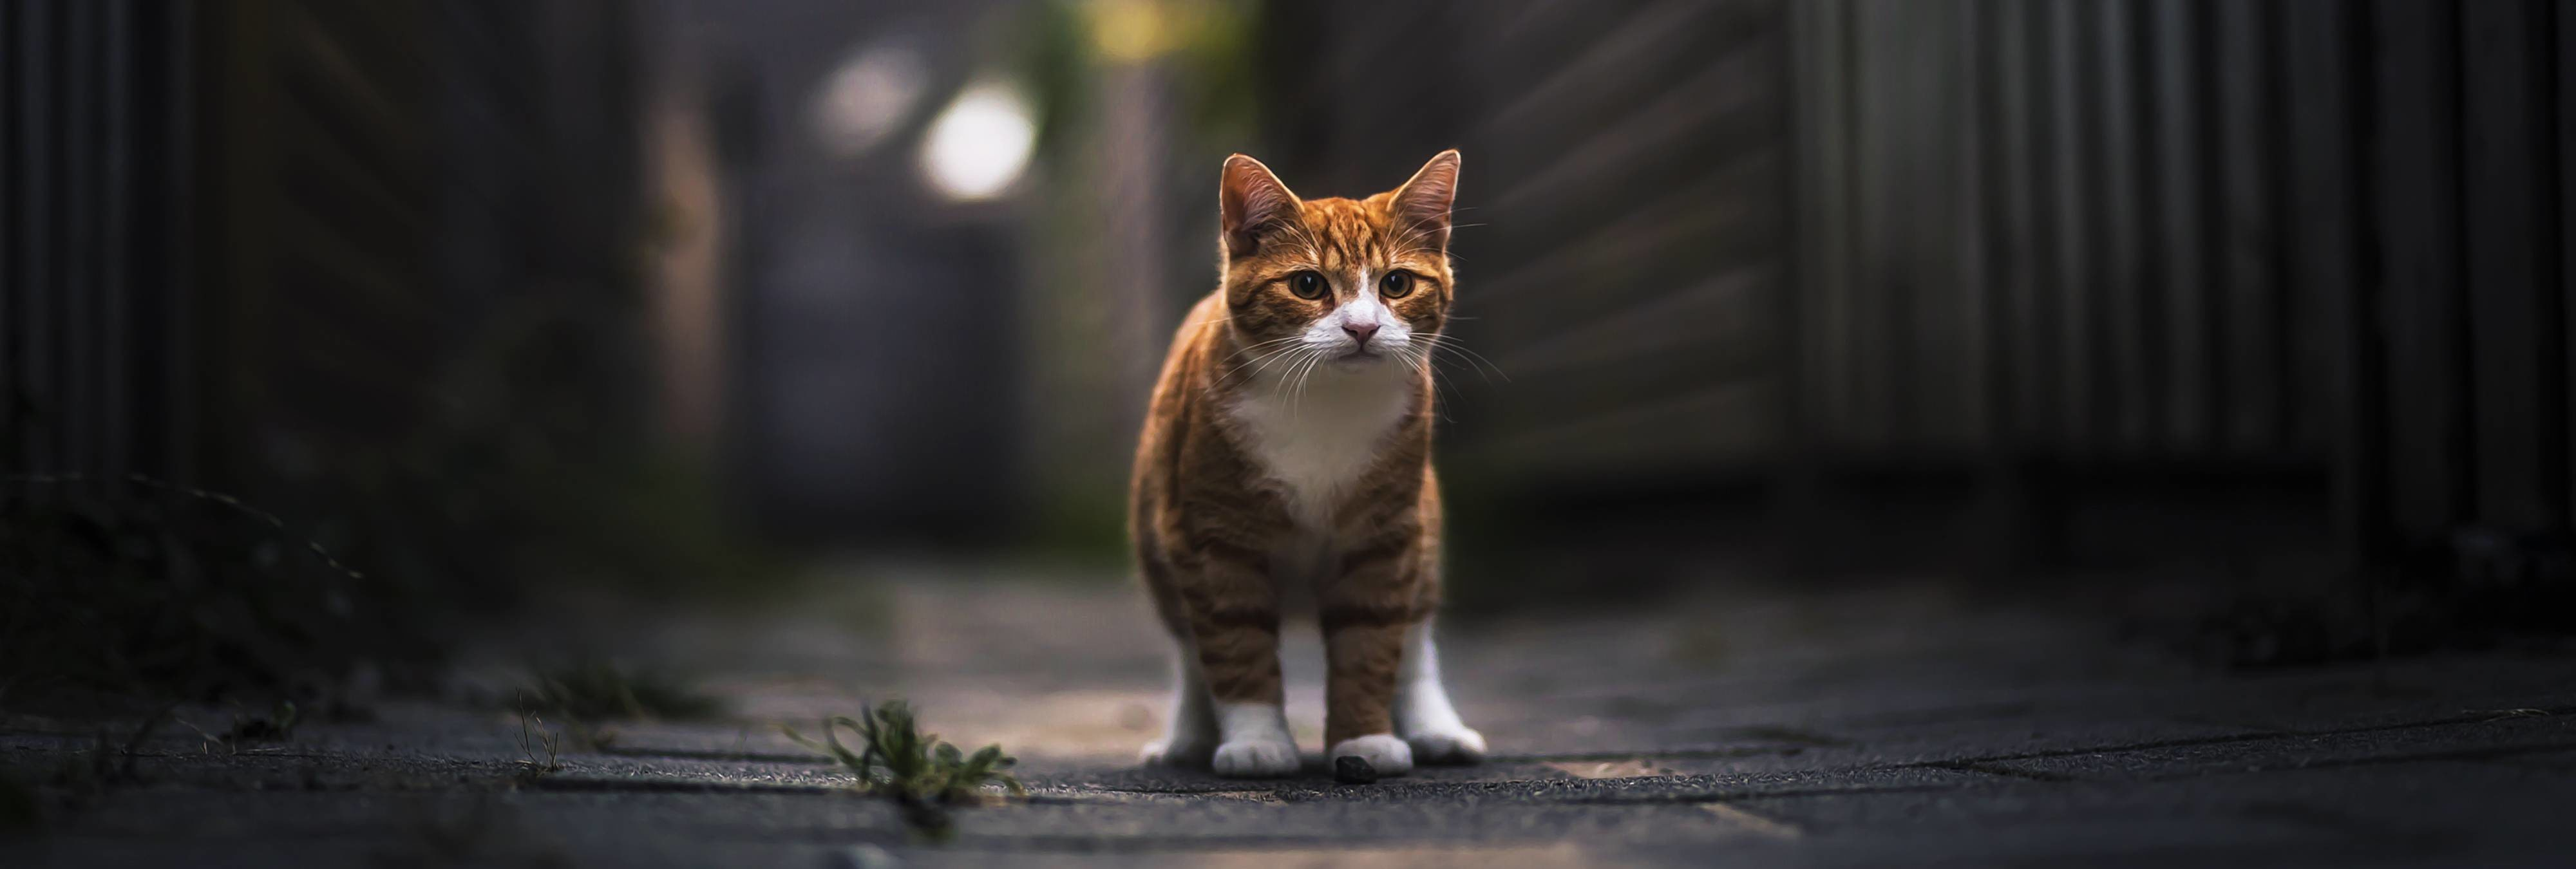 Seis meses de prisión a una pareja por ahorcar a un gato